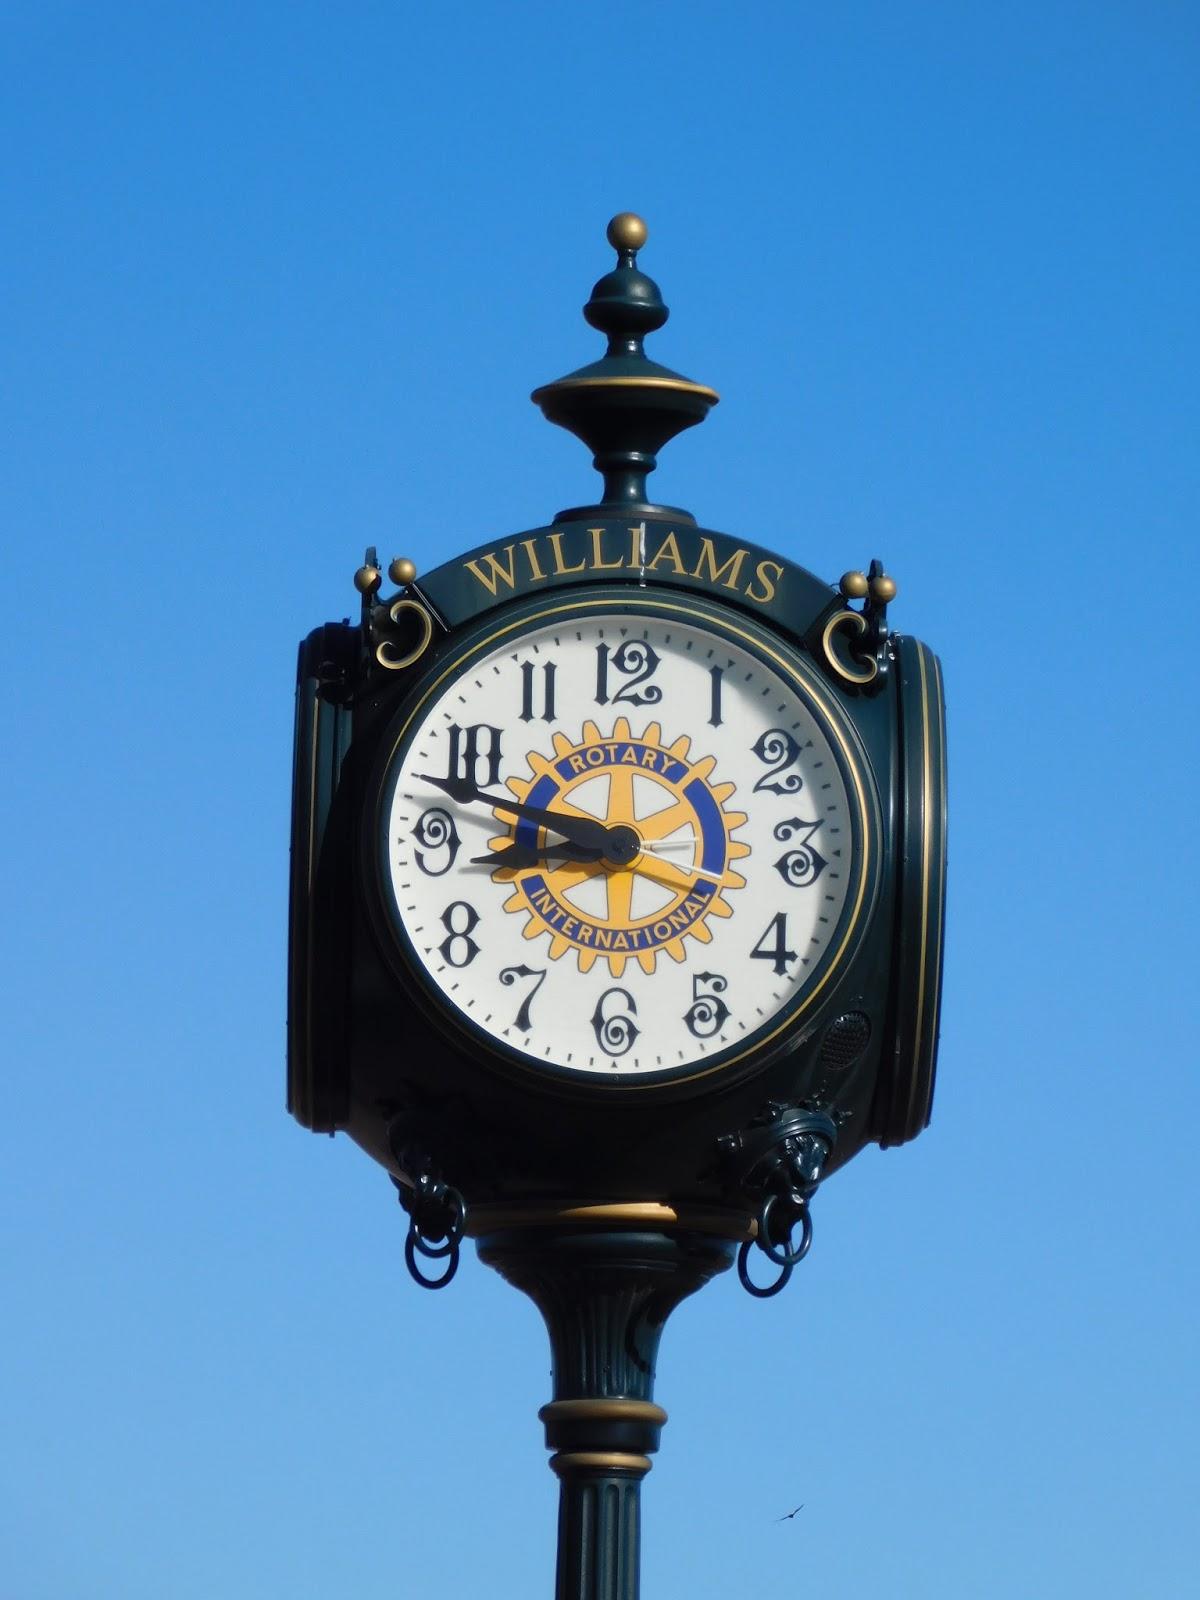 Williams, AZ clock